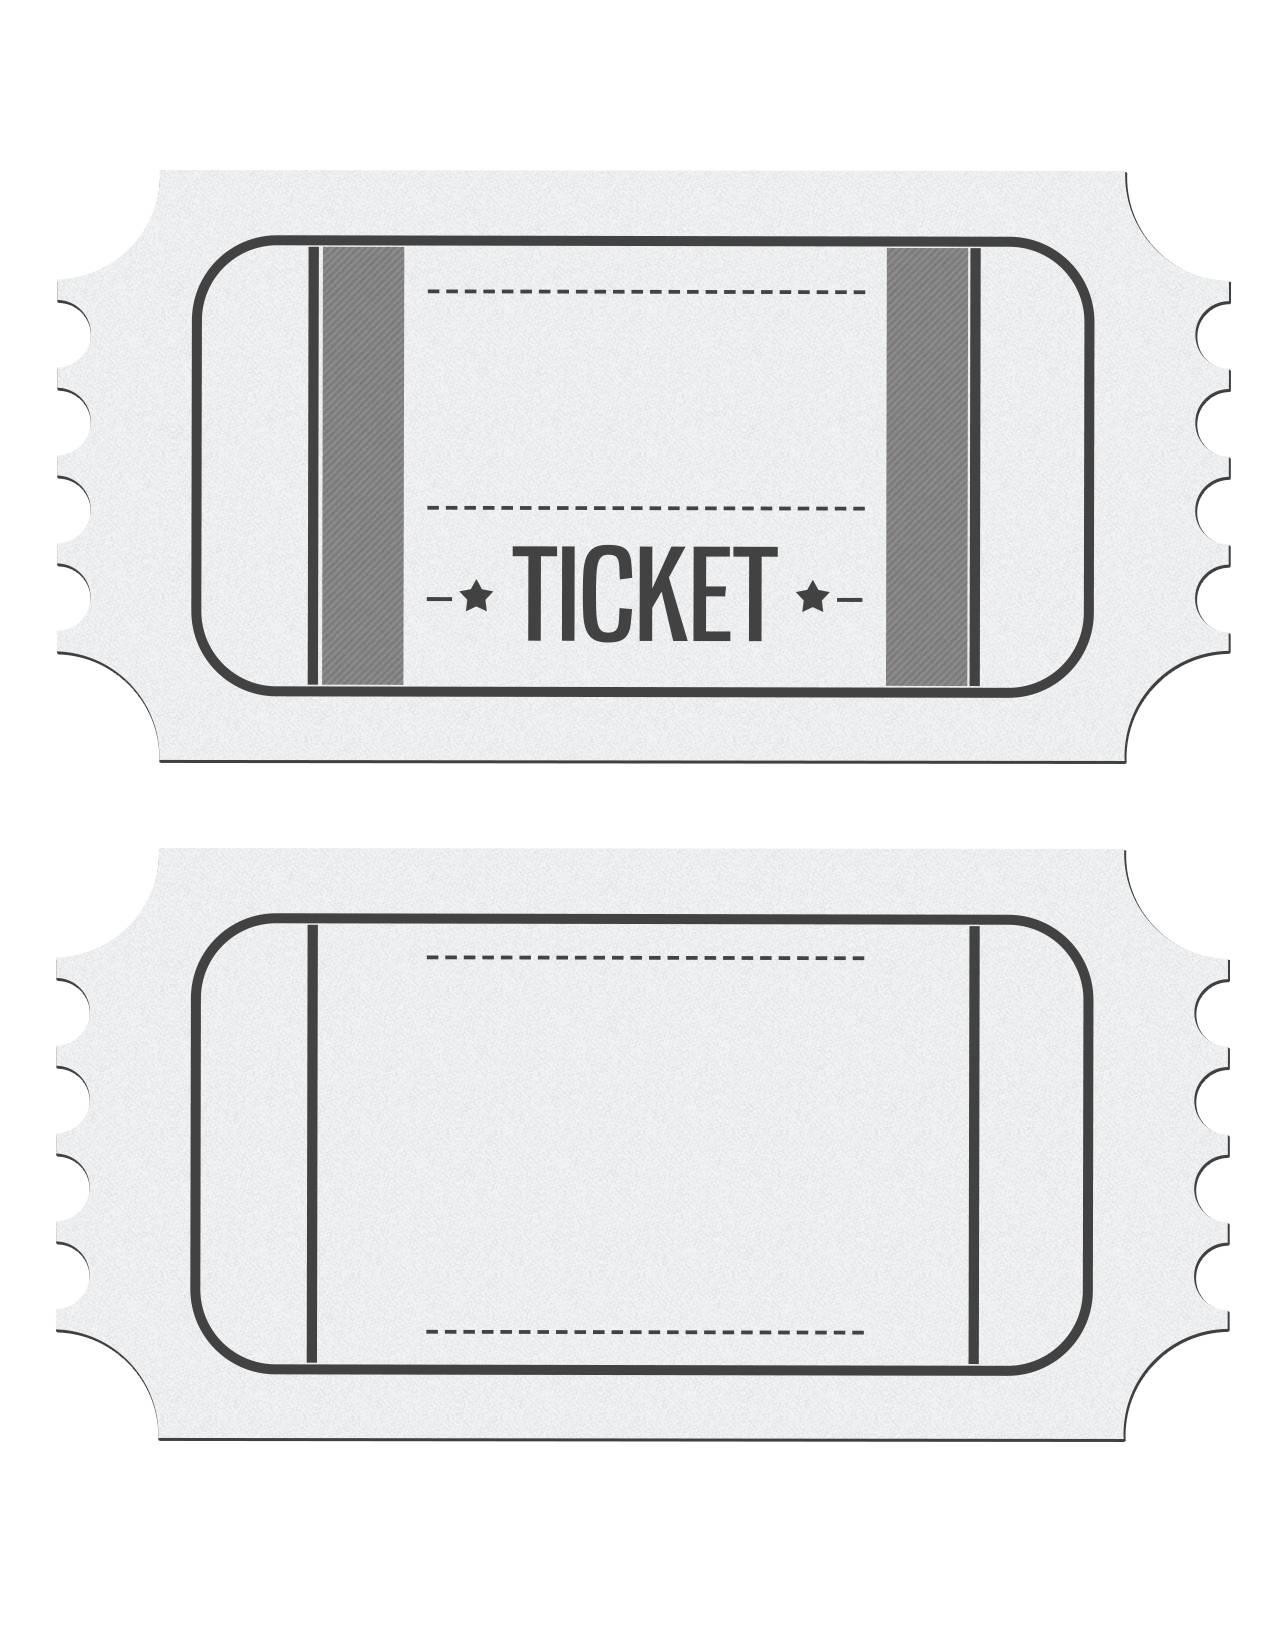 Raffle Ticket Template Pdf